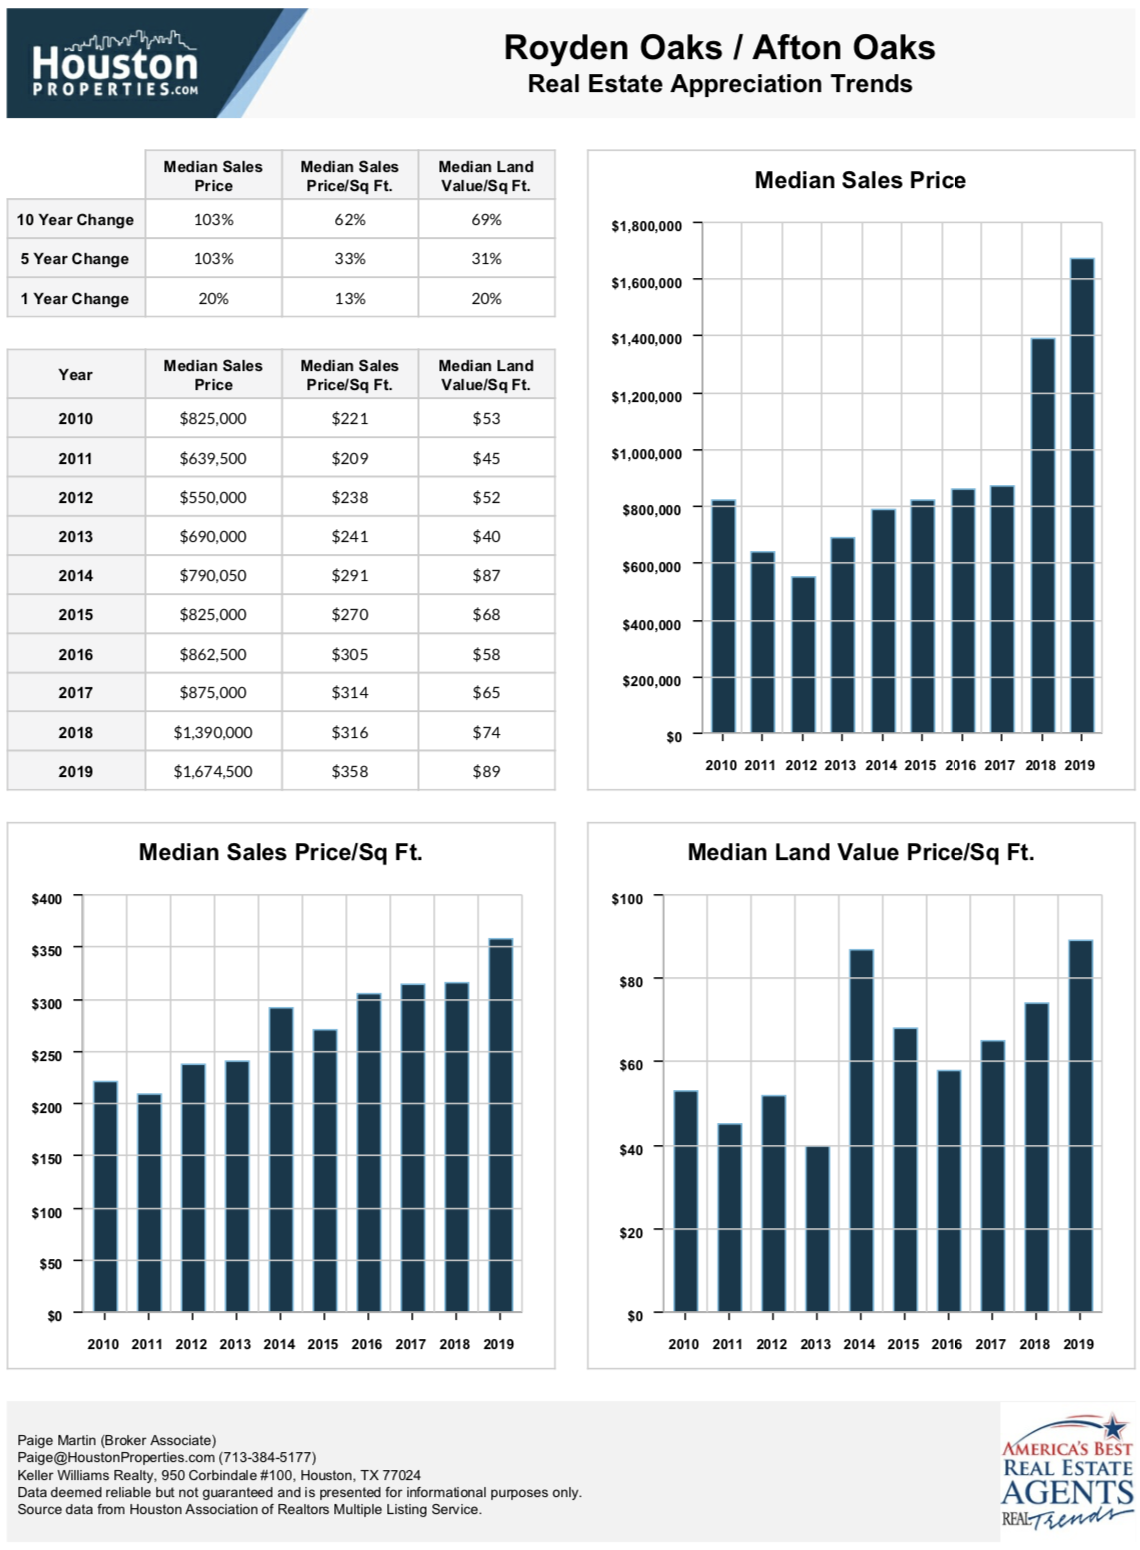 Afton Oaks Real Estate Appreciation Trends